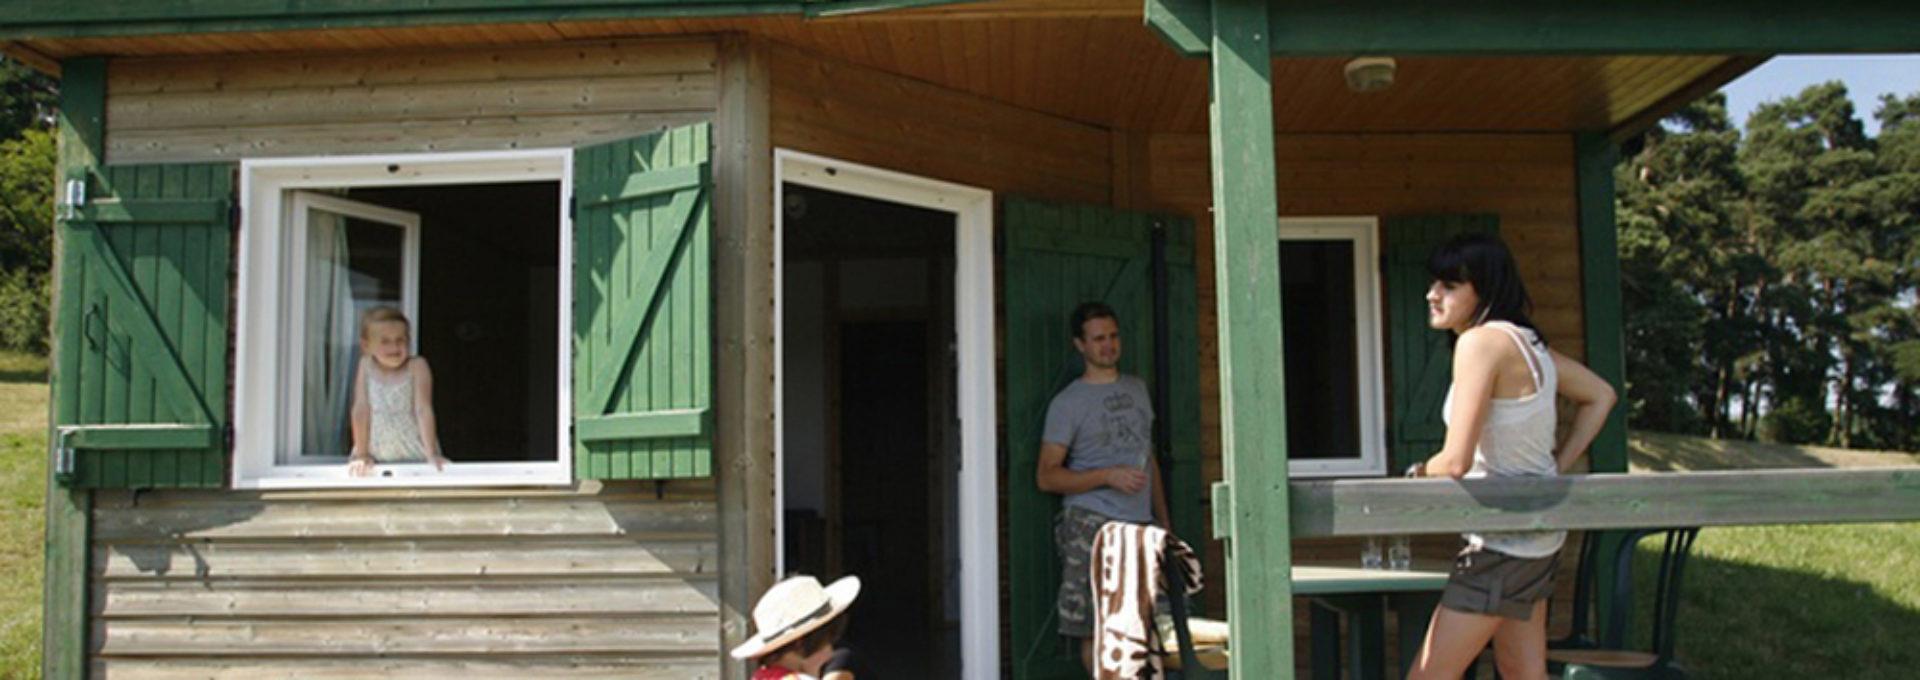 Camping International Roche Murat